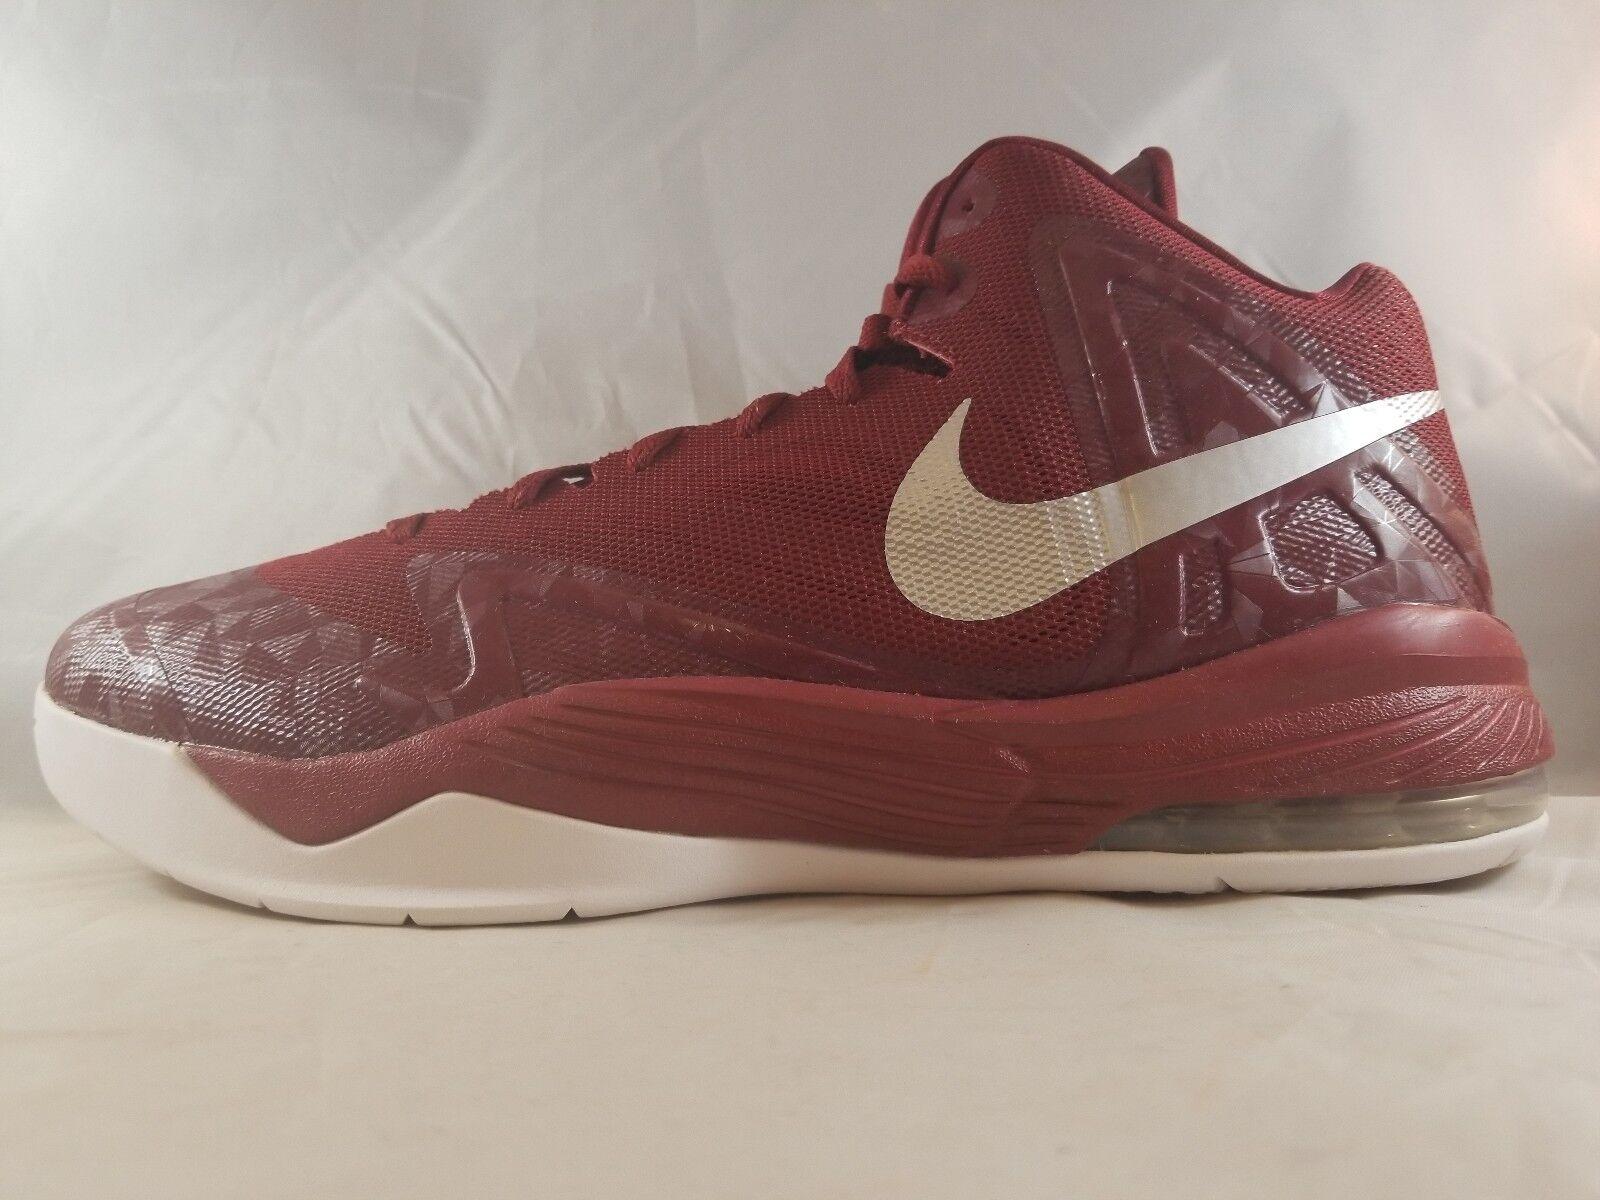 Nike Air Max Shoe Premiere TB Men's Basketball Shoe Max 685775 602 Size 12 71e969